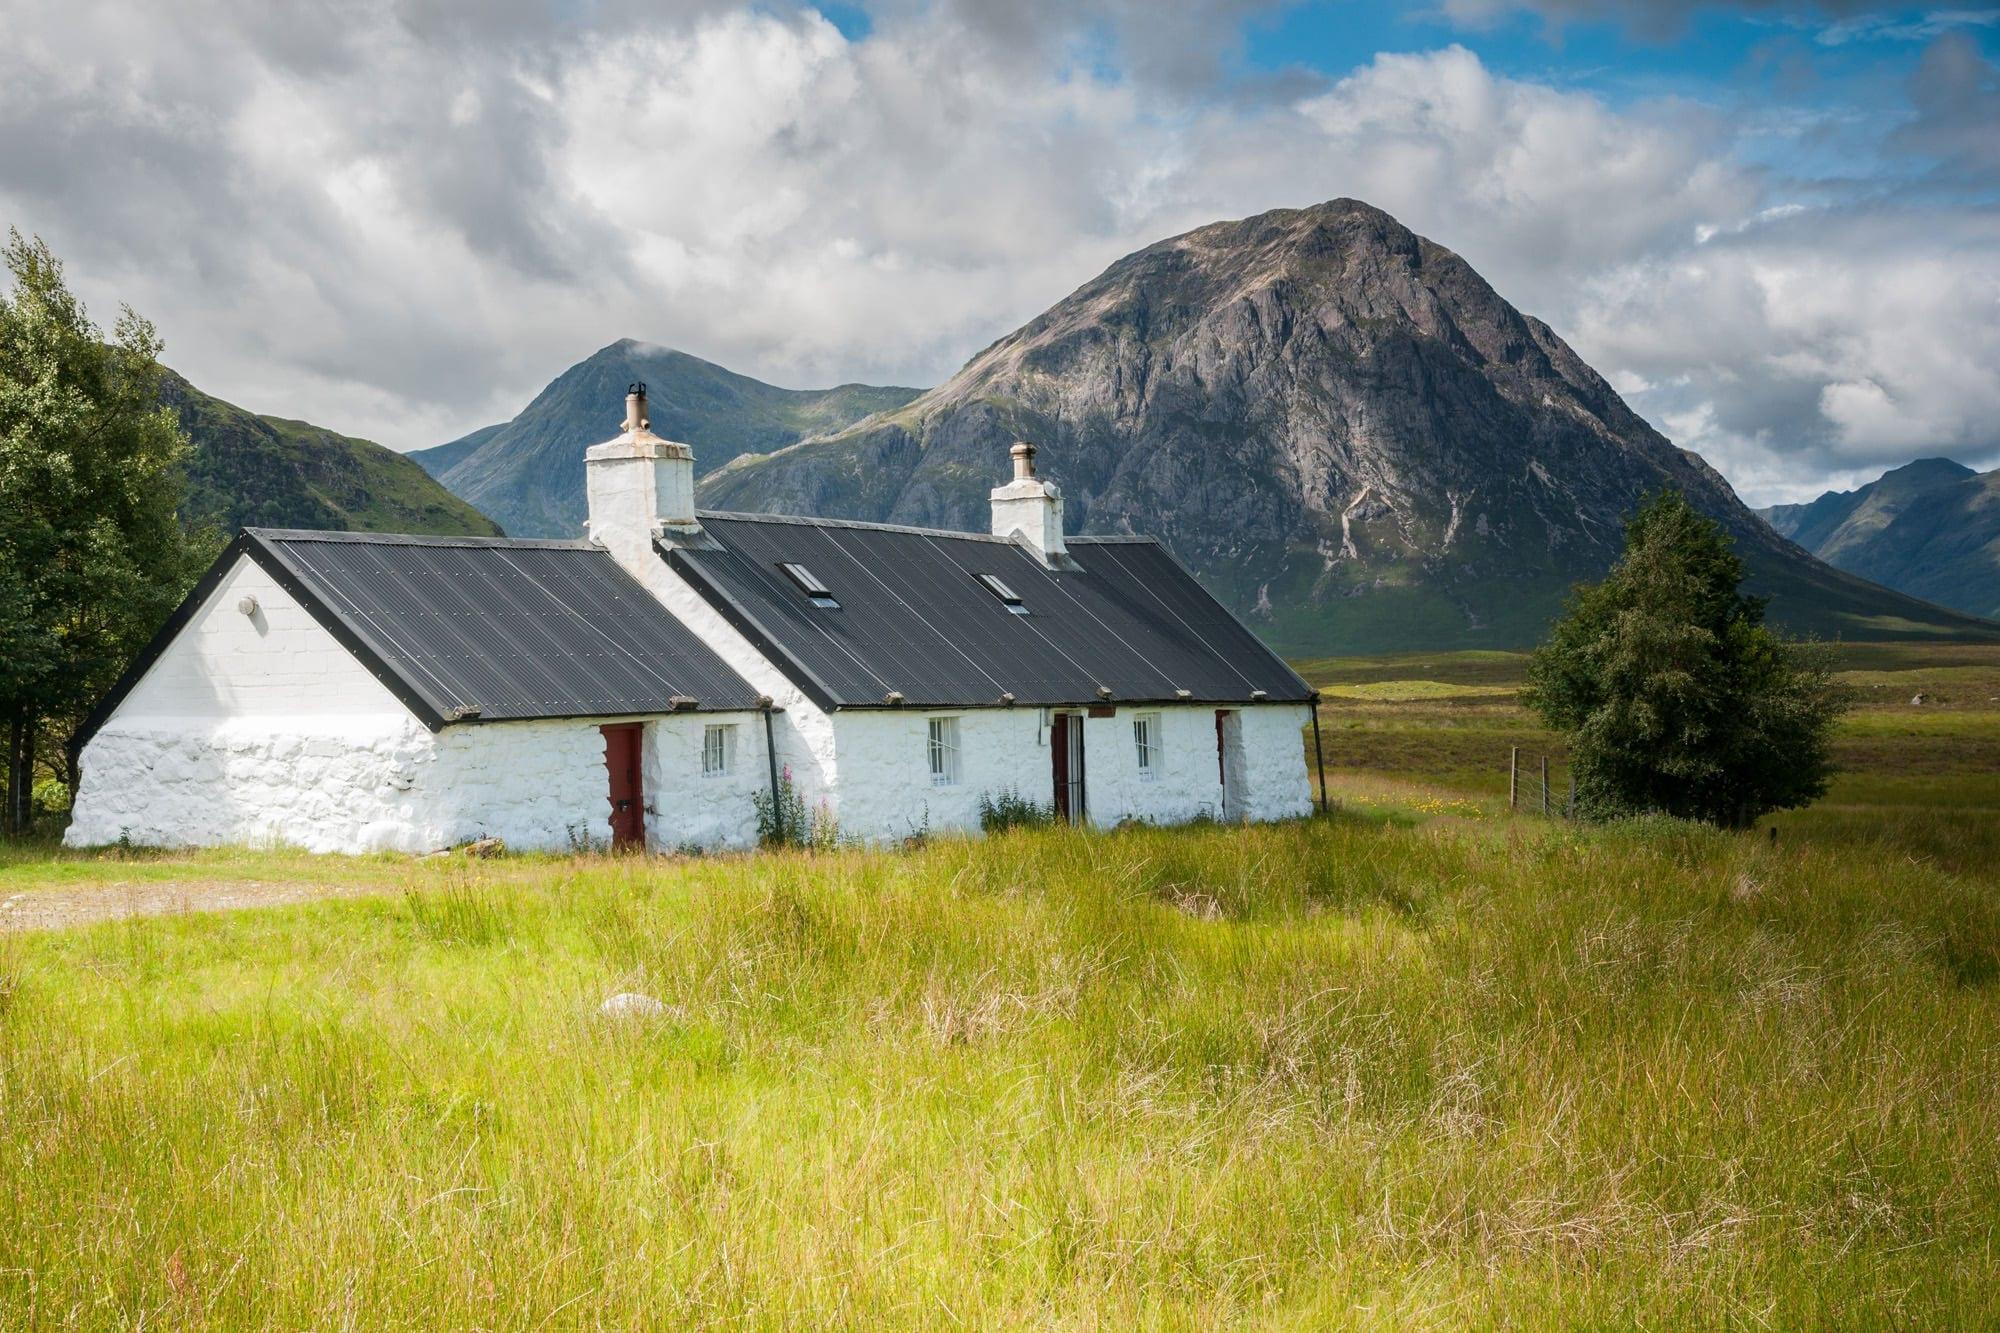 Black Rock Cottage - Scotland Photography